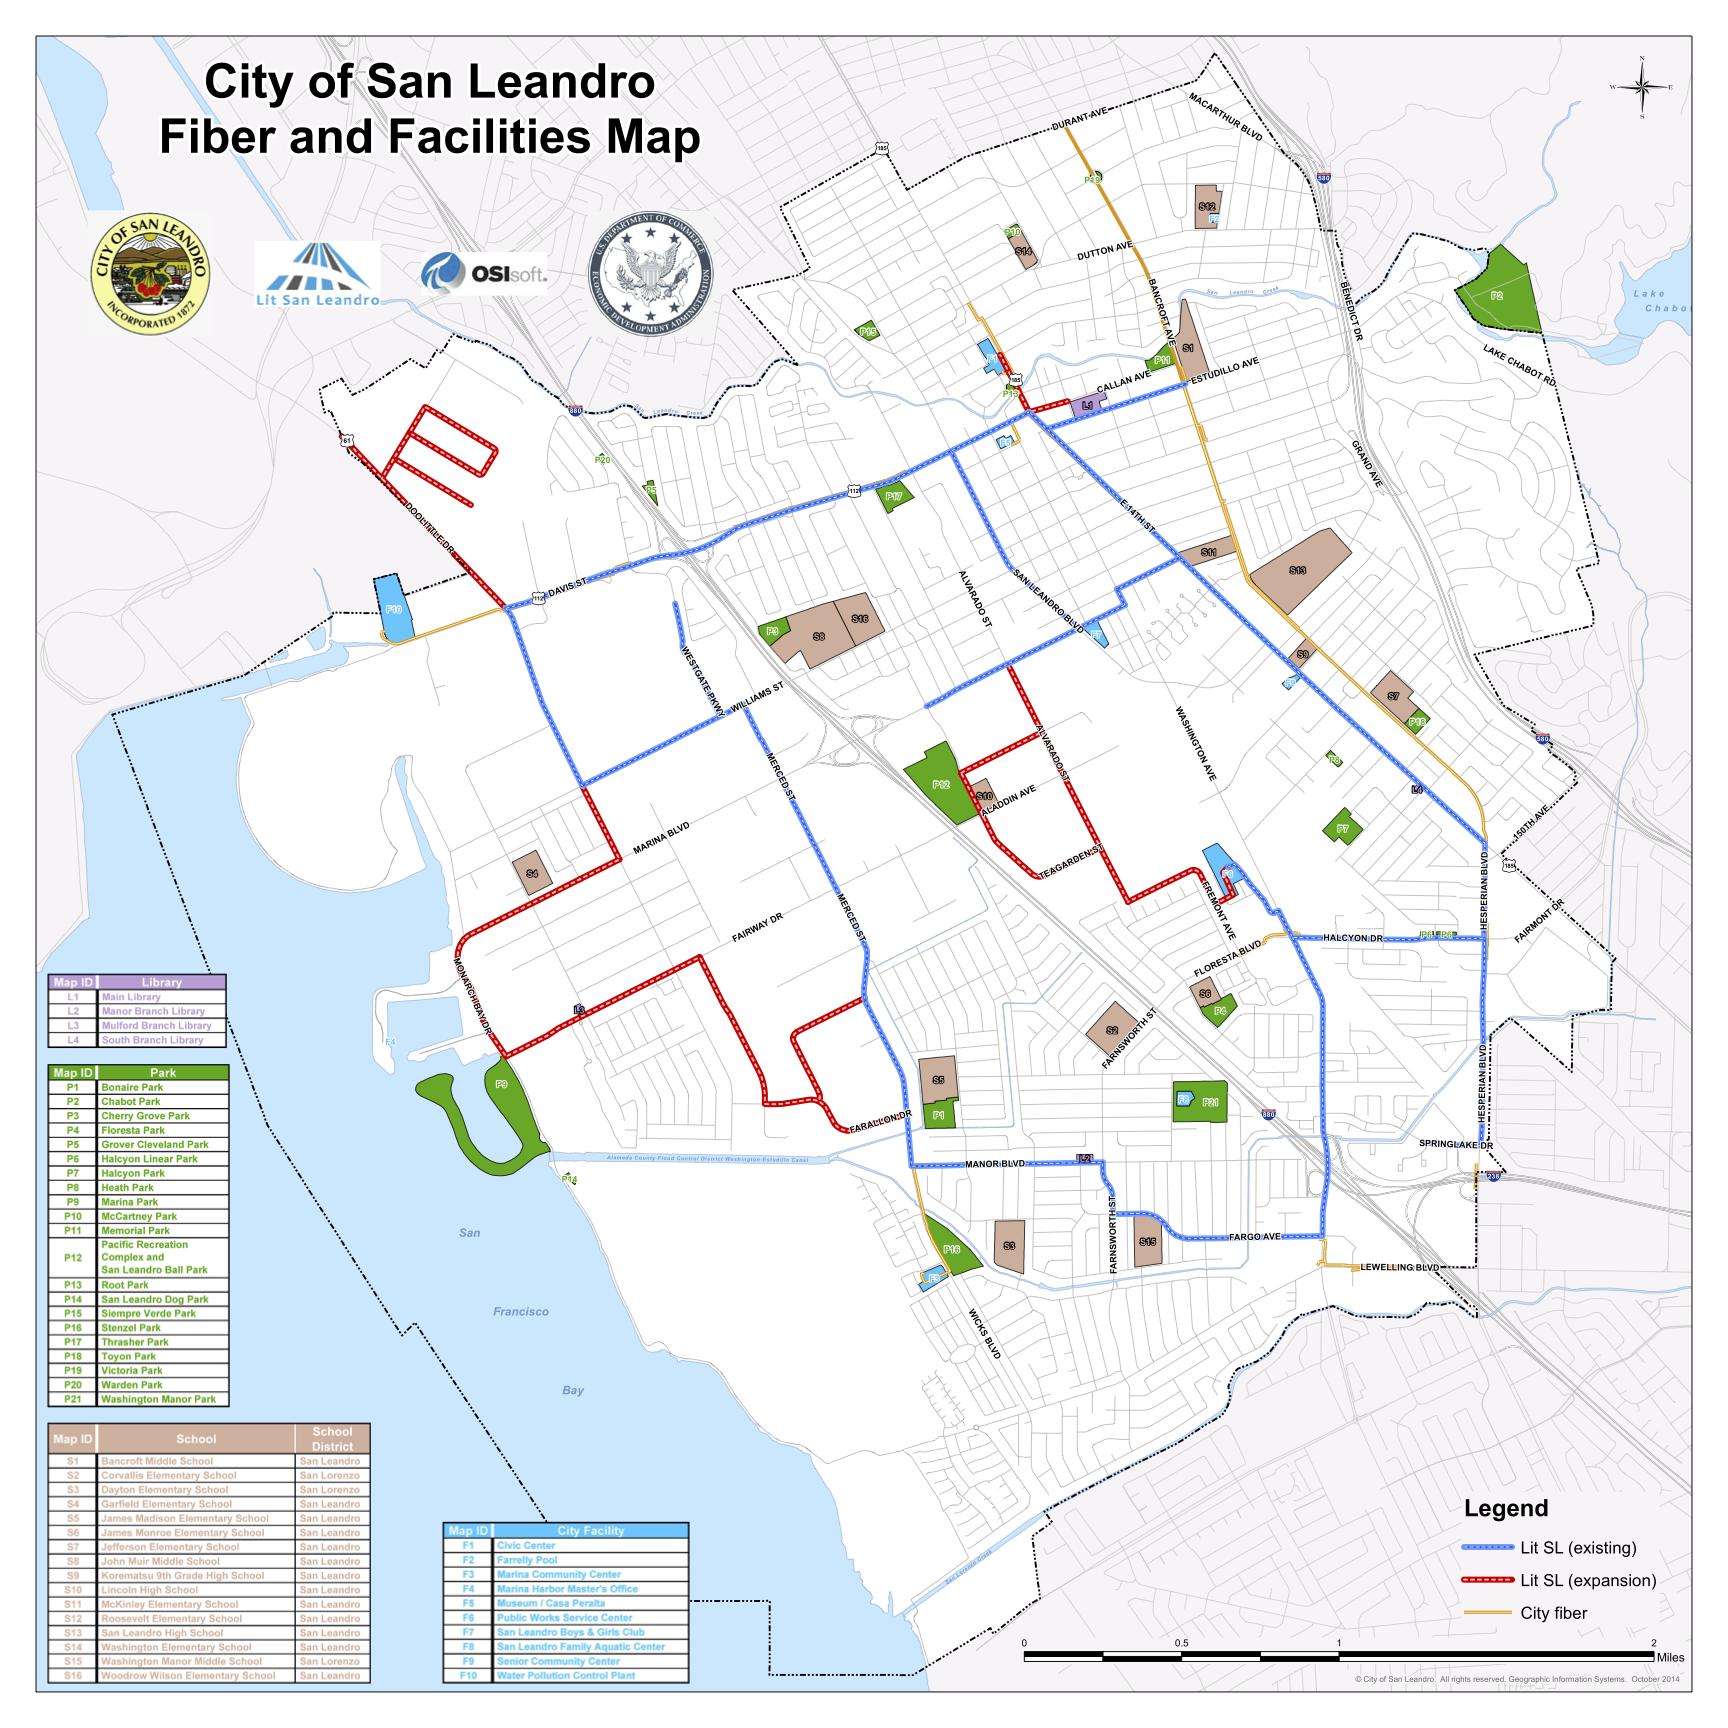 City of San Leandro Fiber and Facilities Map